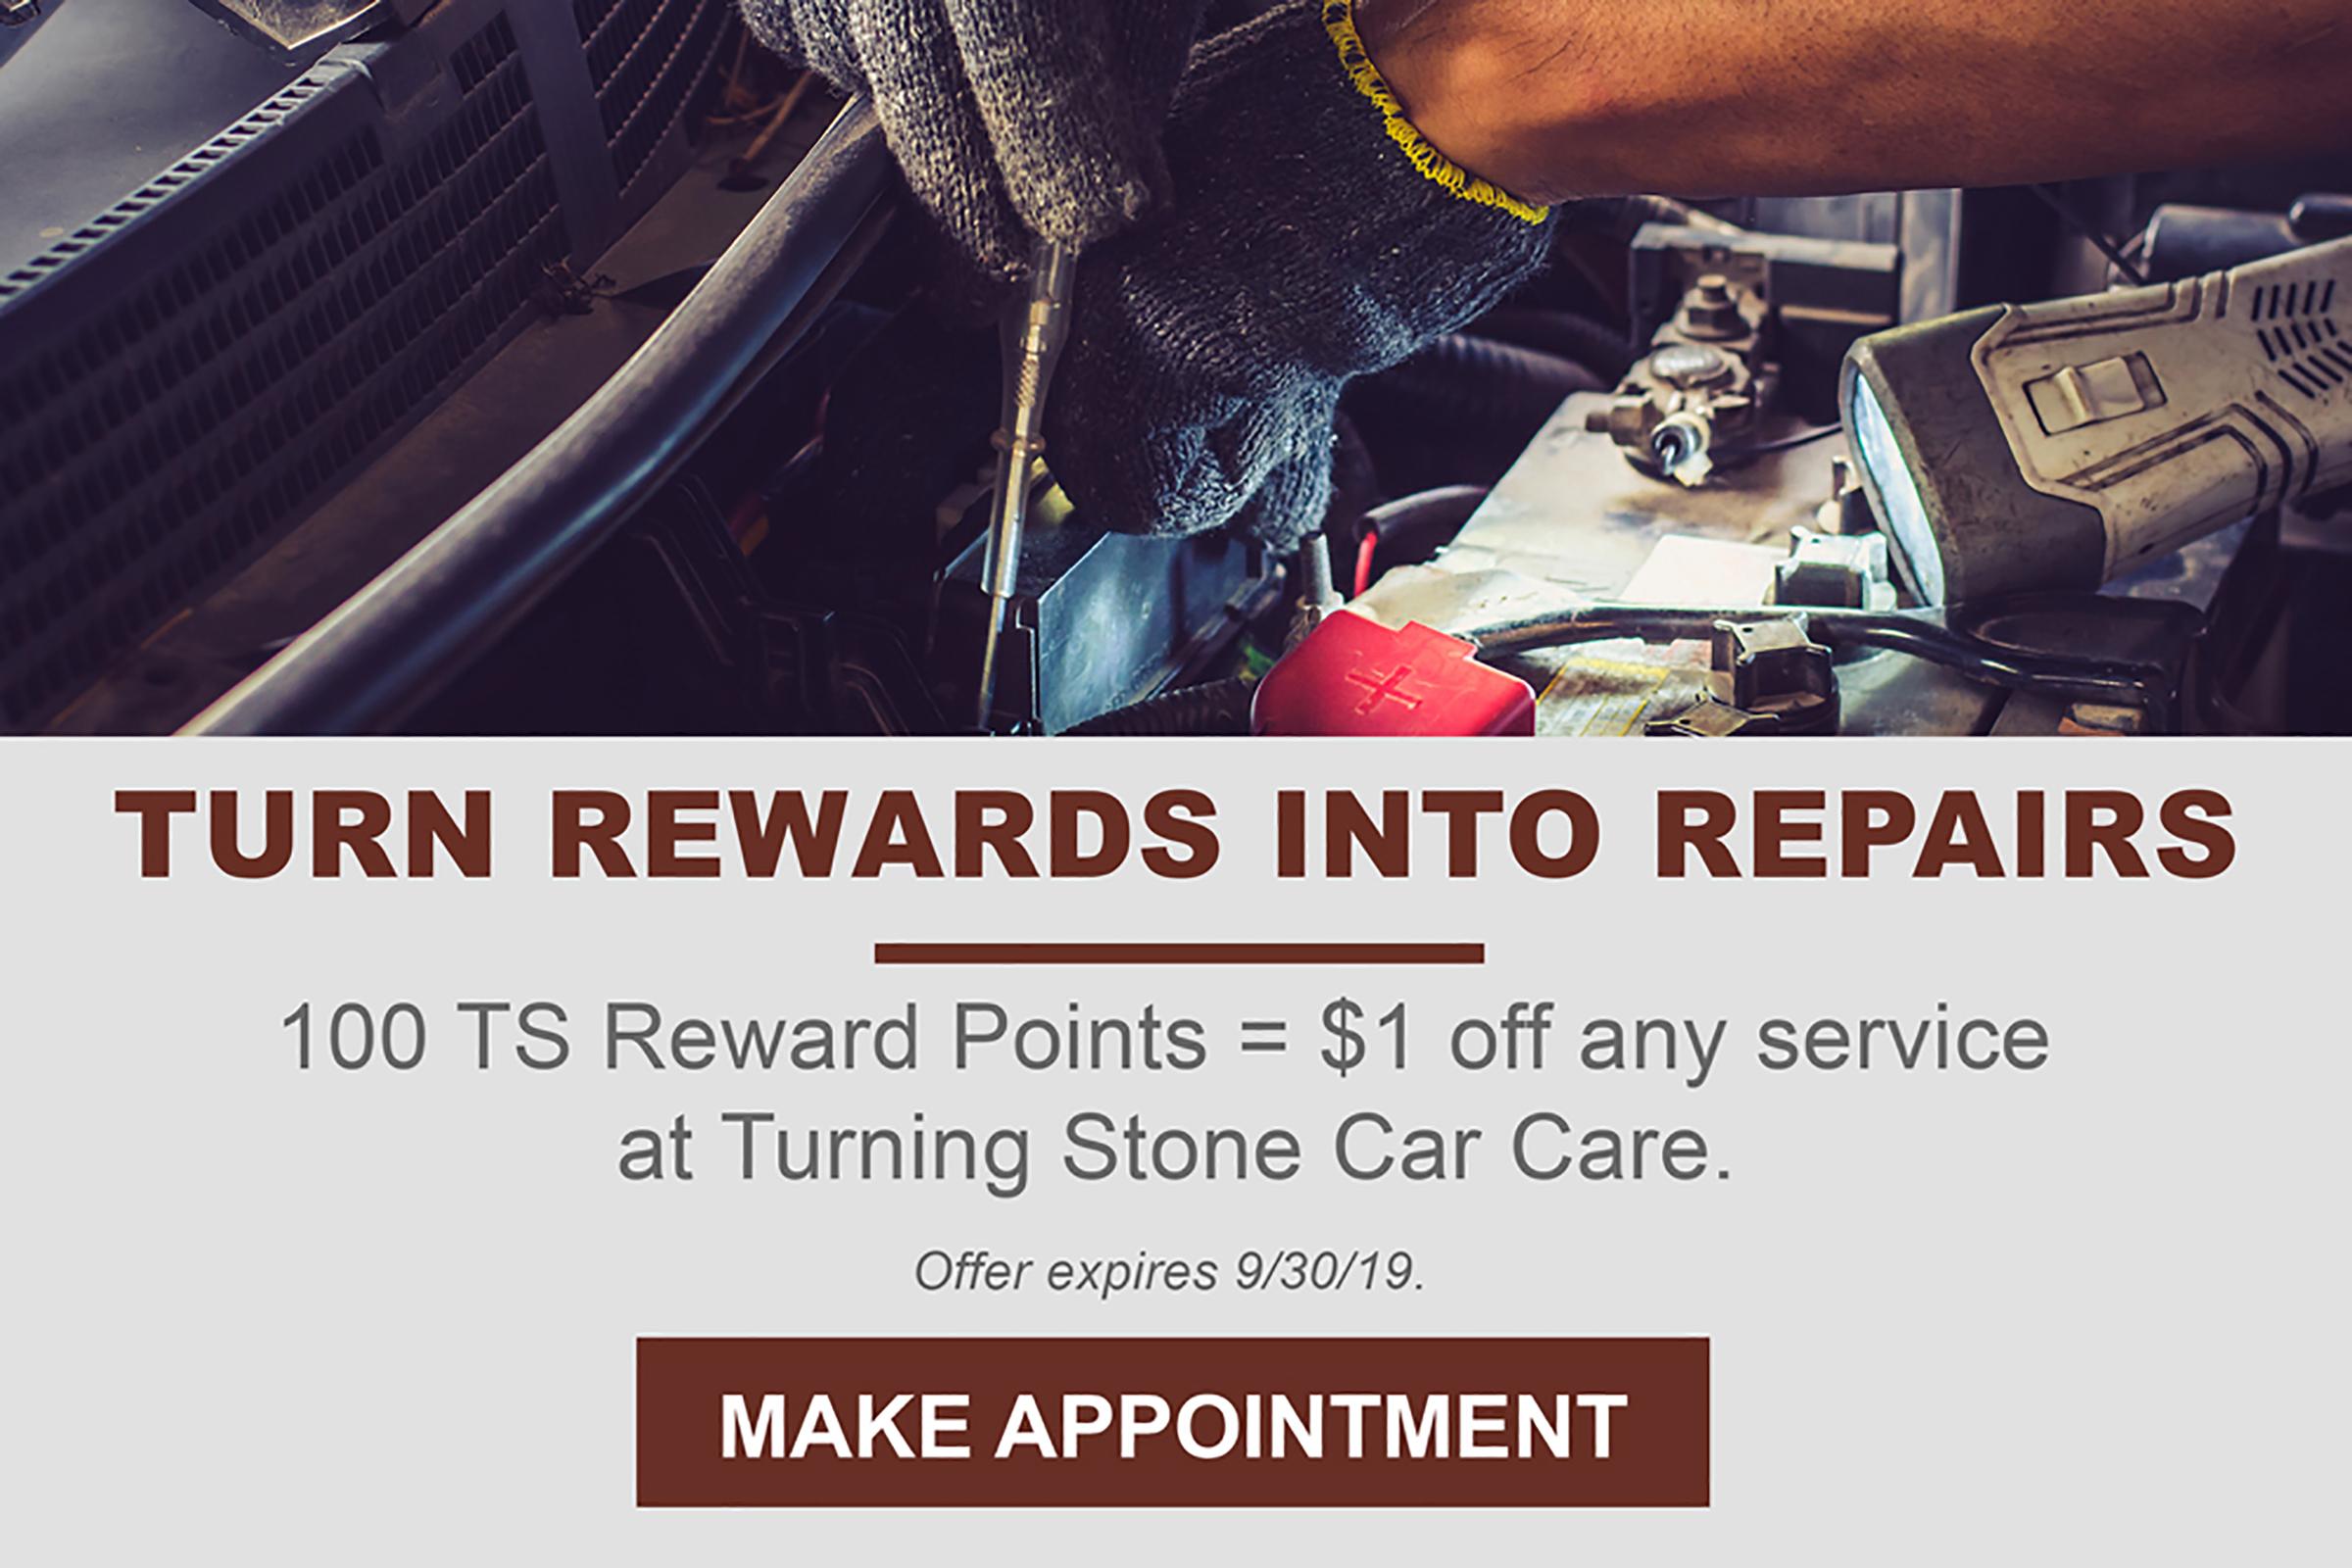 Car Care Tip